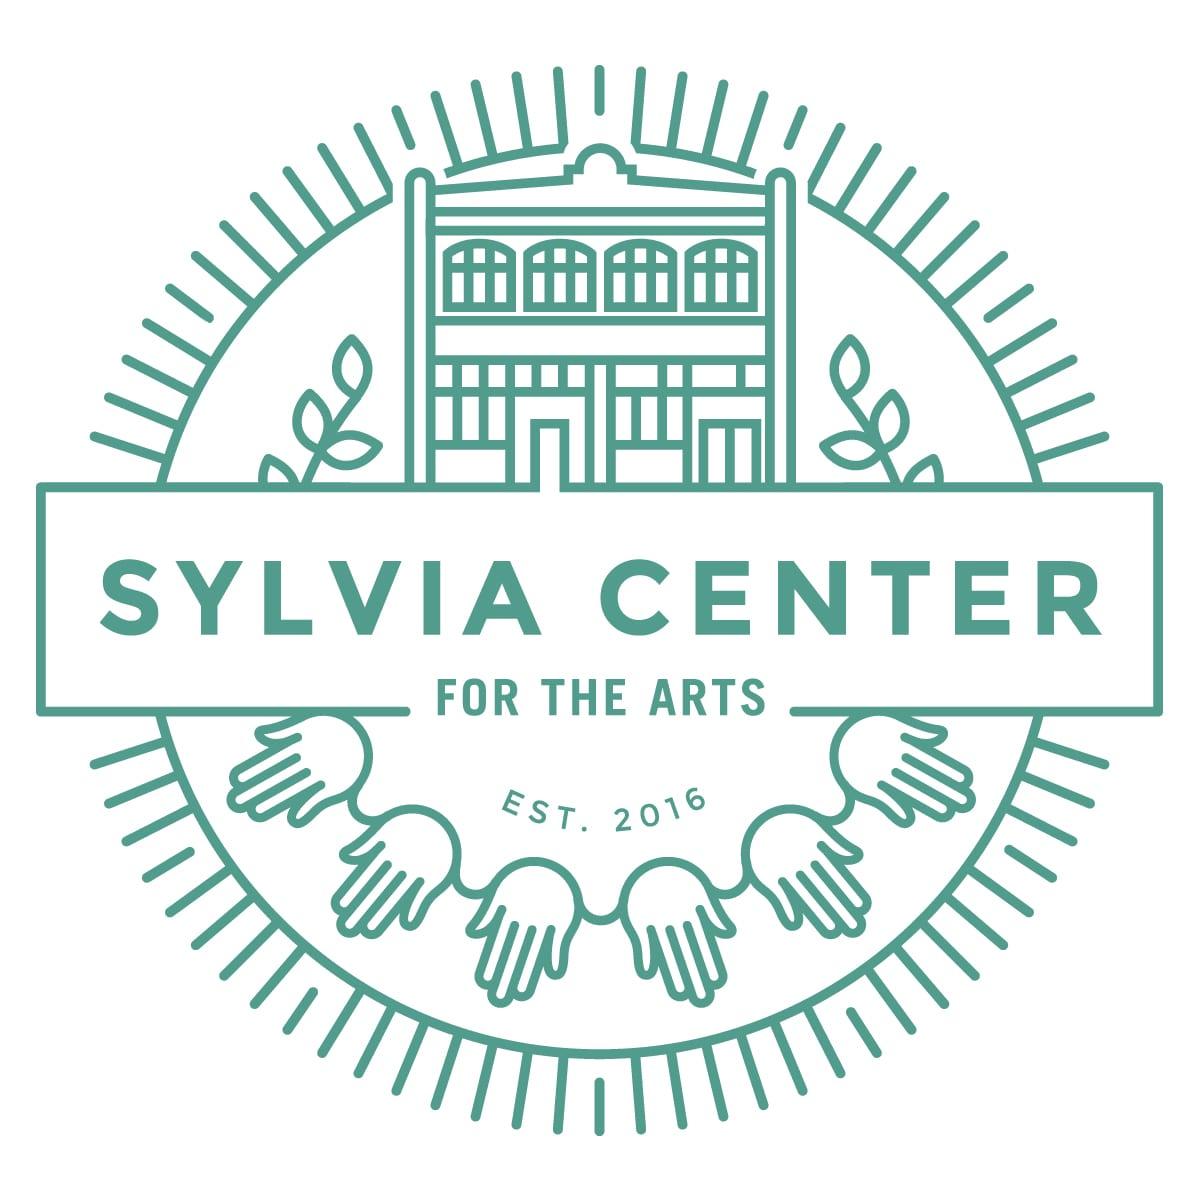 Sylvia Center Crest Sage (1) Shu Ling Zhao